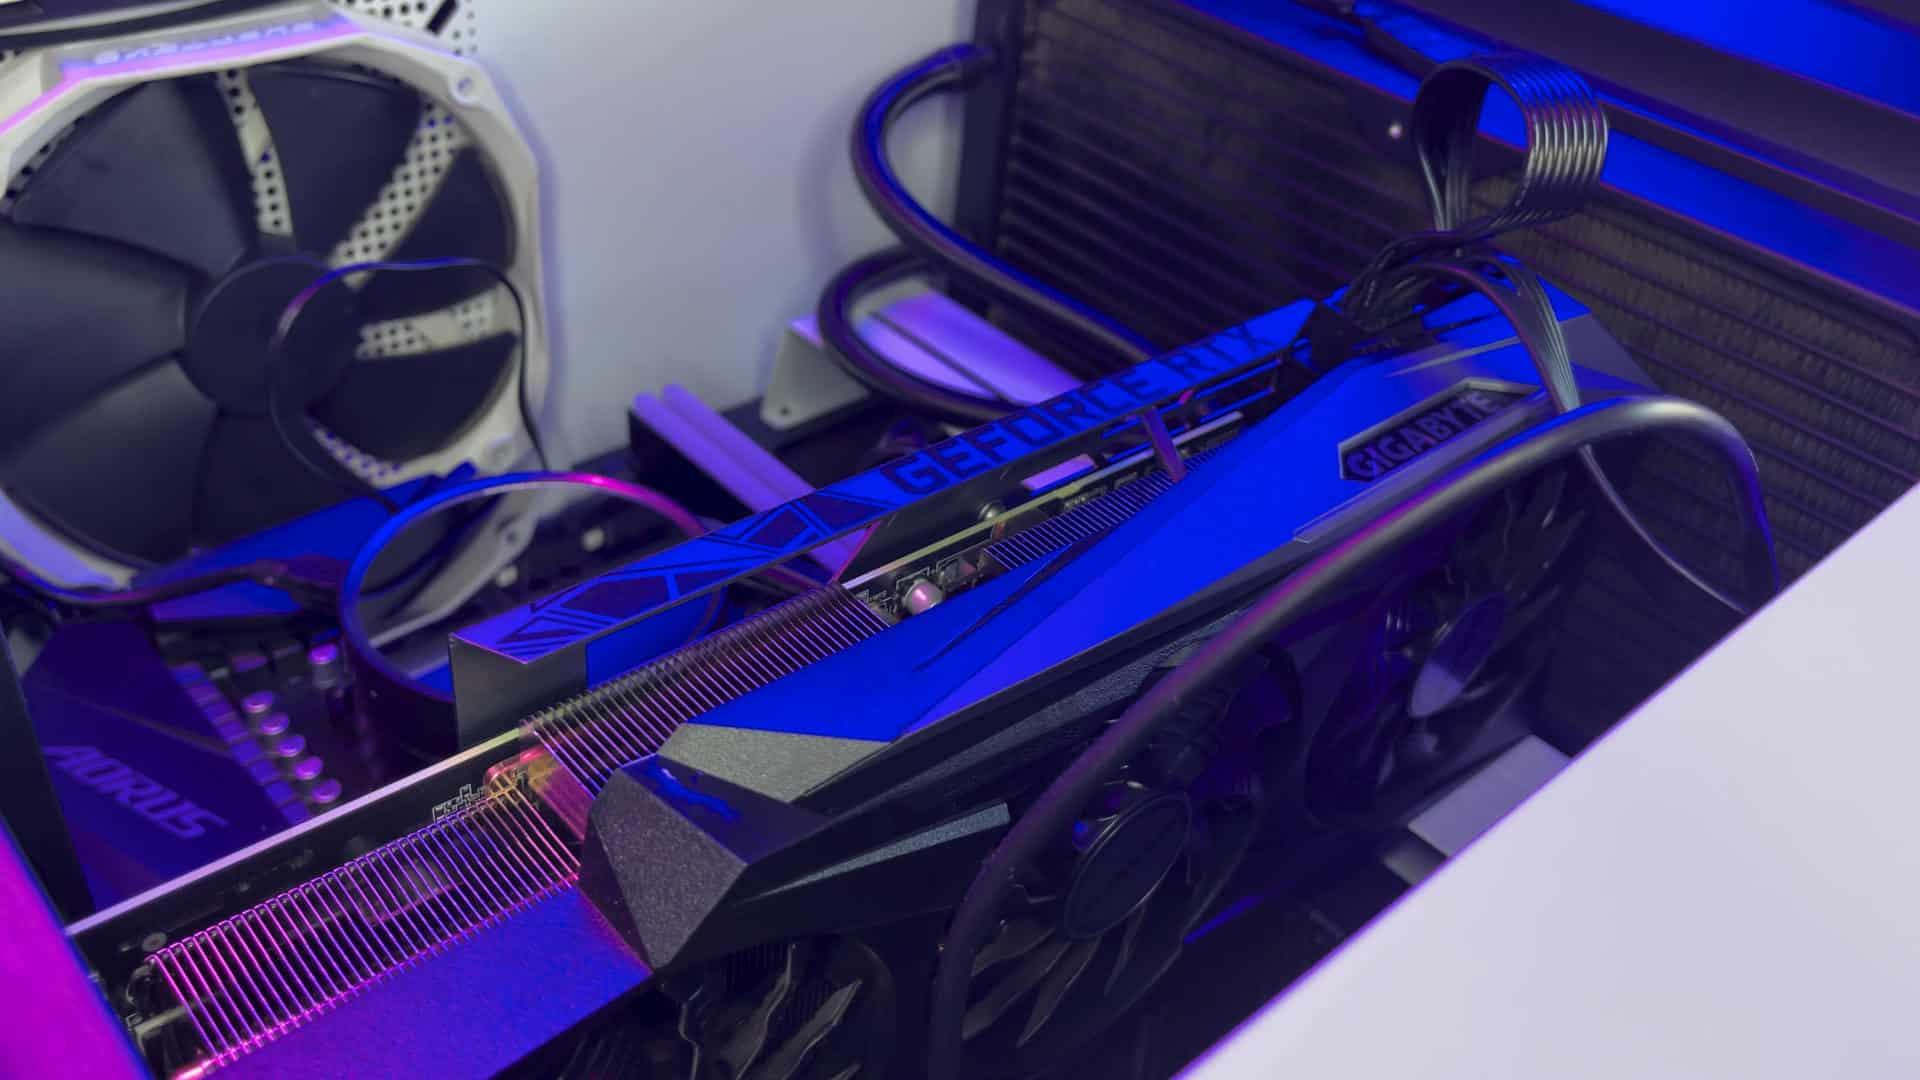 Gigabyte GeForce RTX 3080 Ti Gaming OC Review